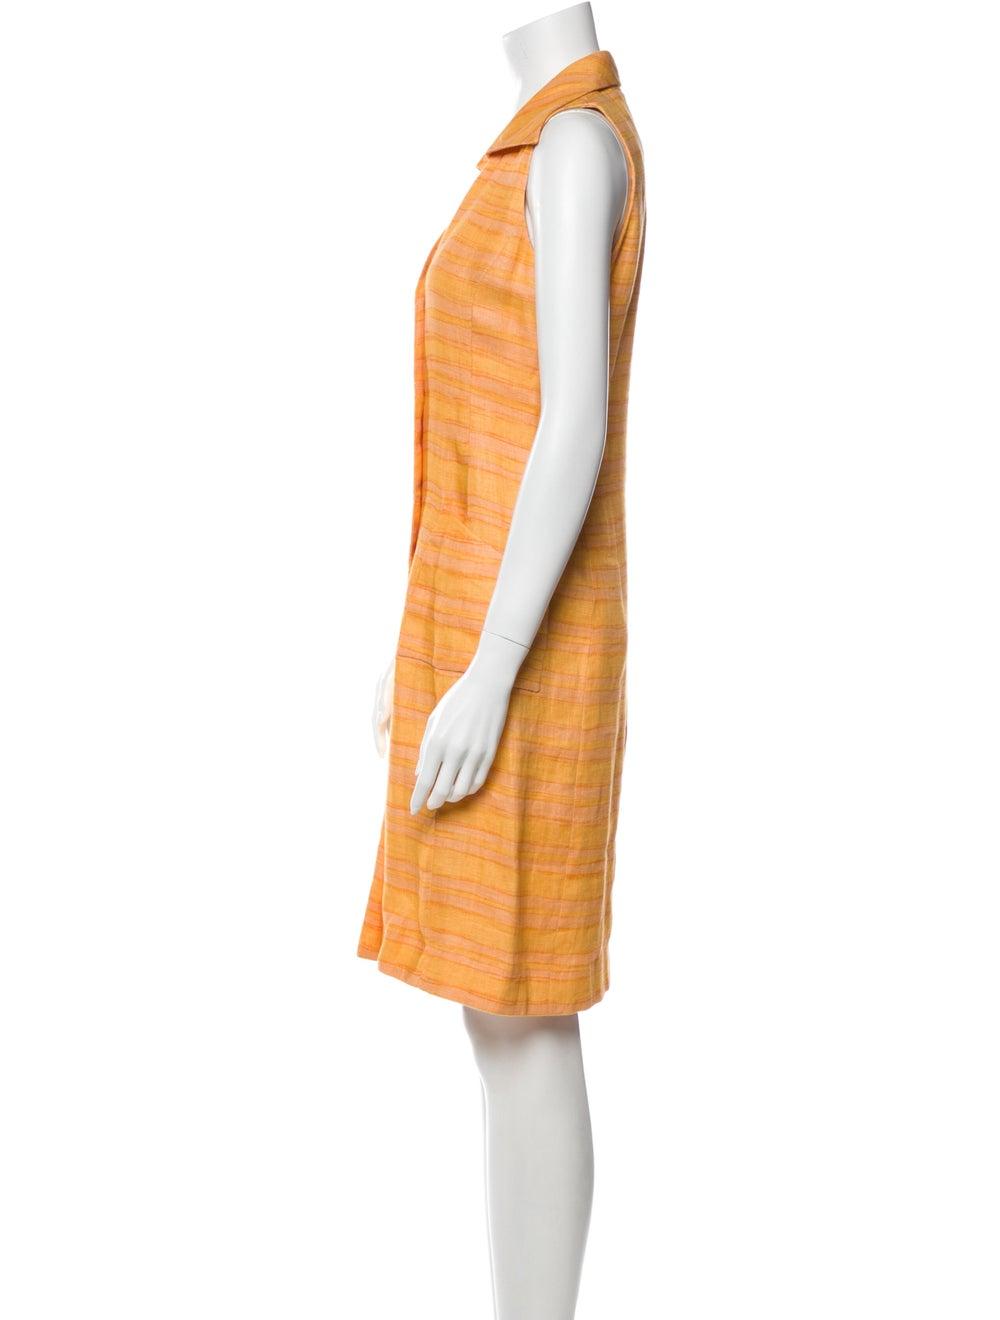 Oscar de la Renta Striped Knee-Length Dress Orange - image 2